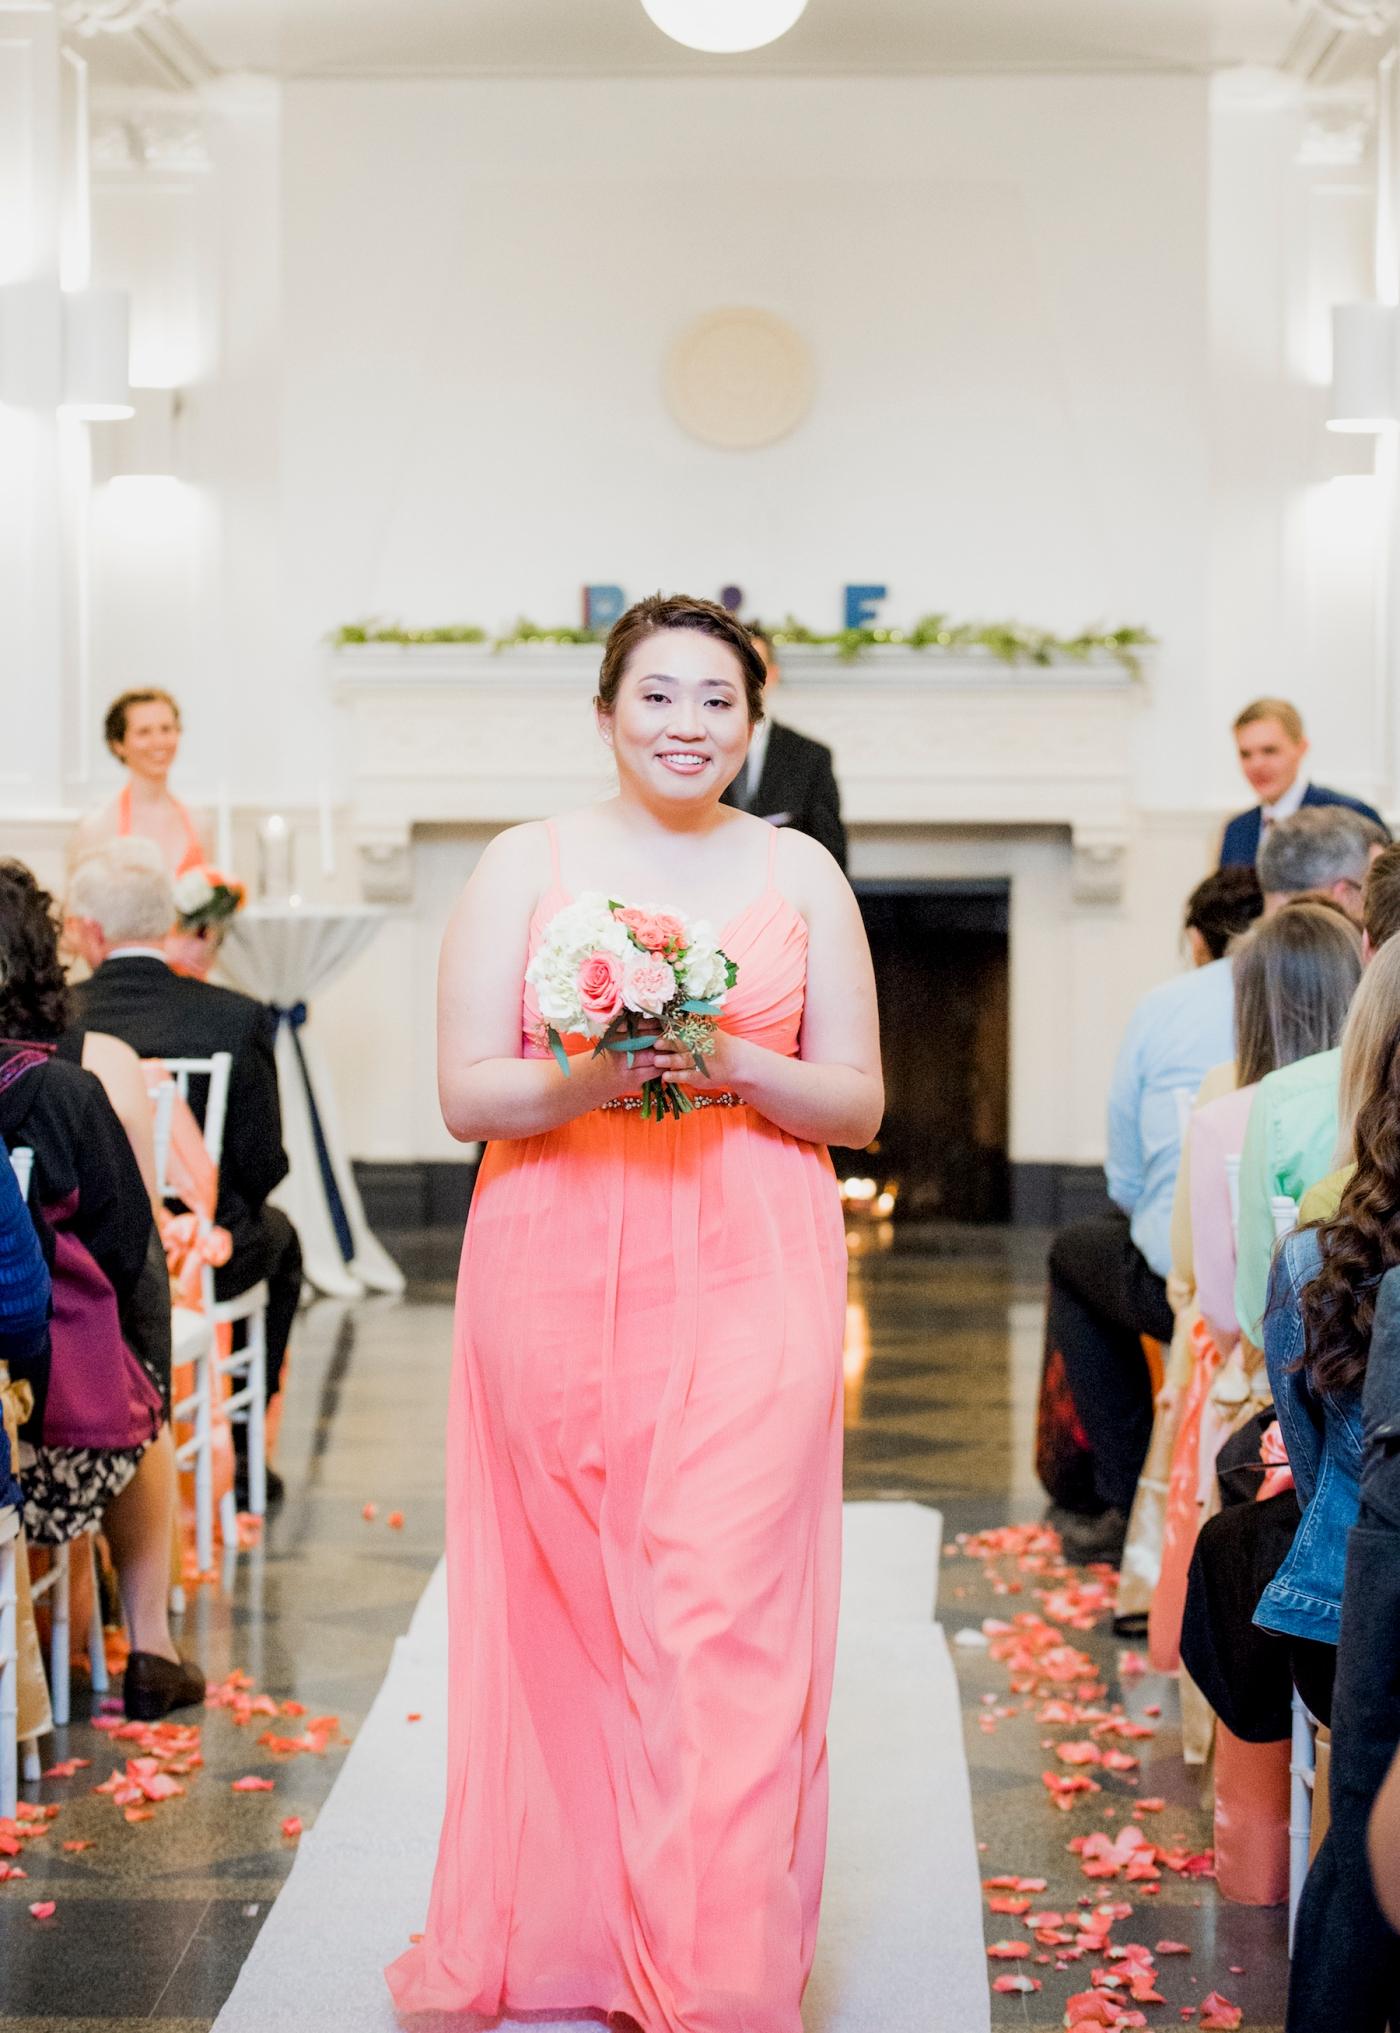 DSC_2765Everett_Wedding_Ballroom_Jane_Speleers_photography_Rachel_and_Edmund_Ceremony_2017